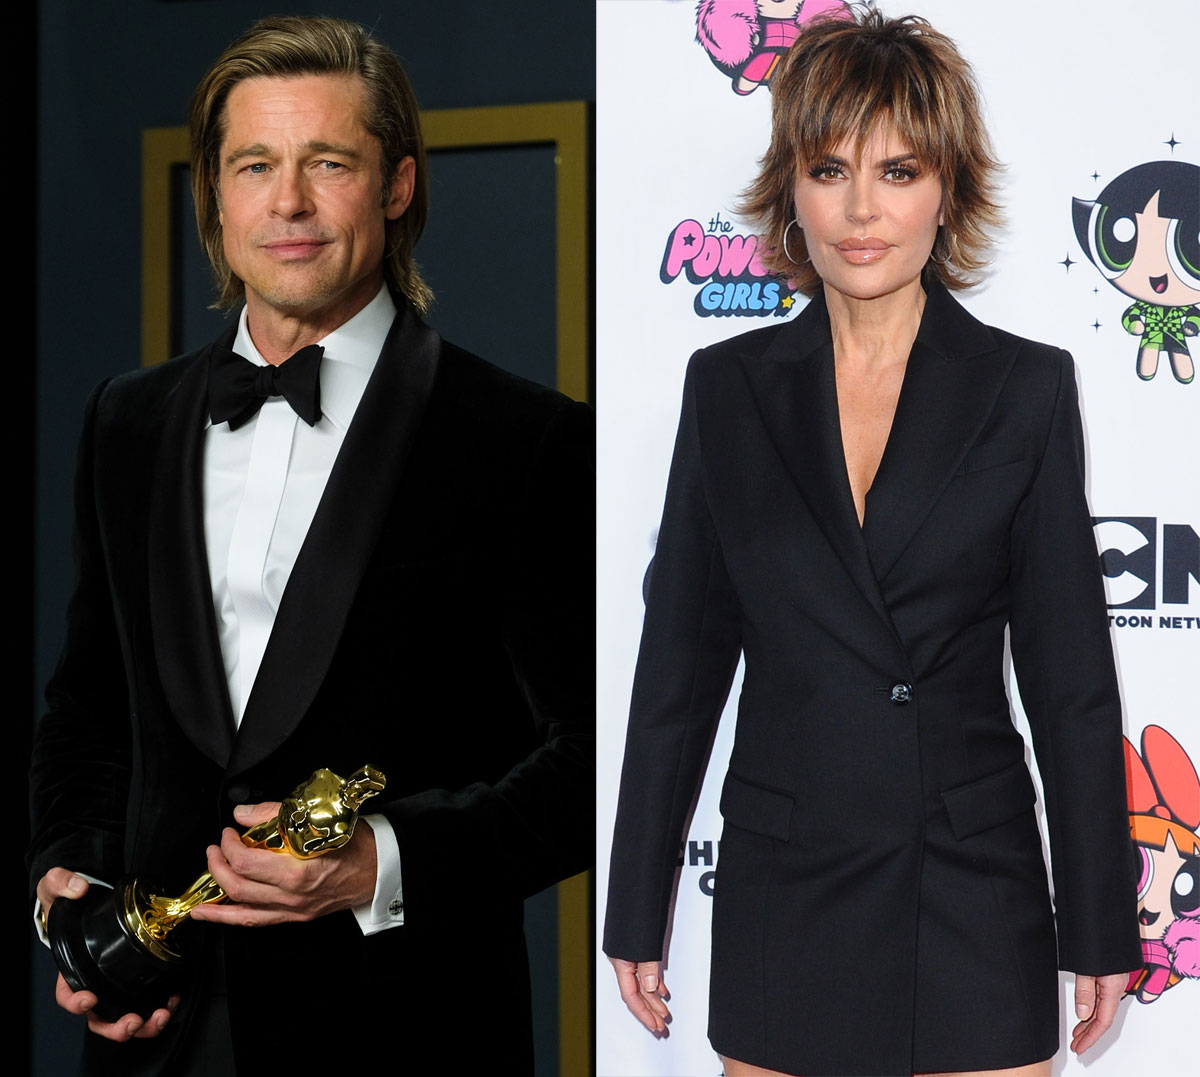 Brad Pitt and Lisa Rinna are actually the same age!